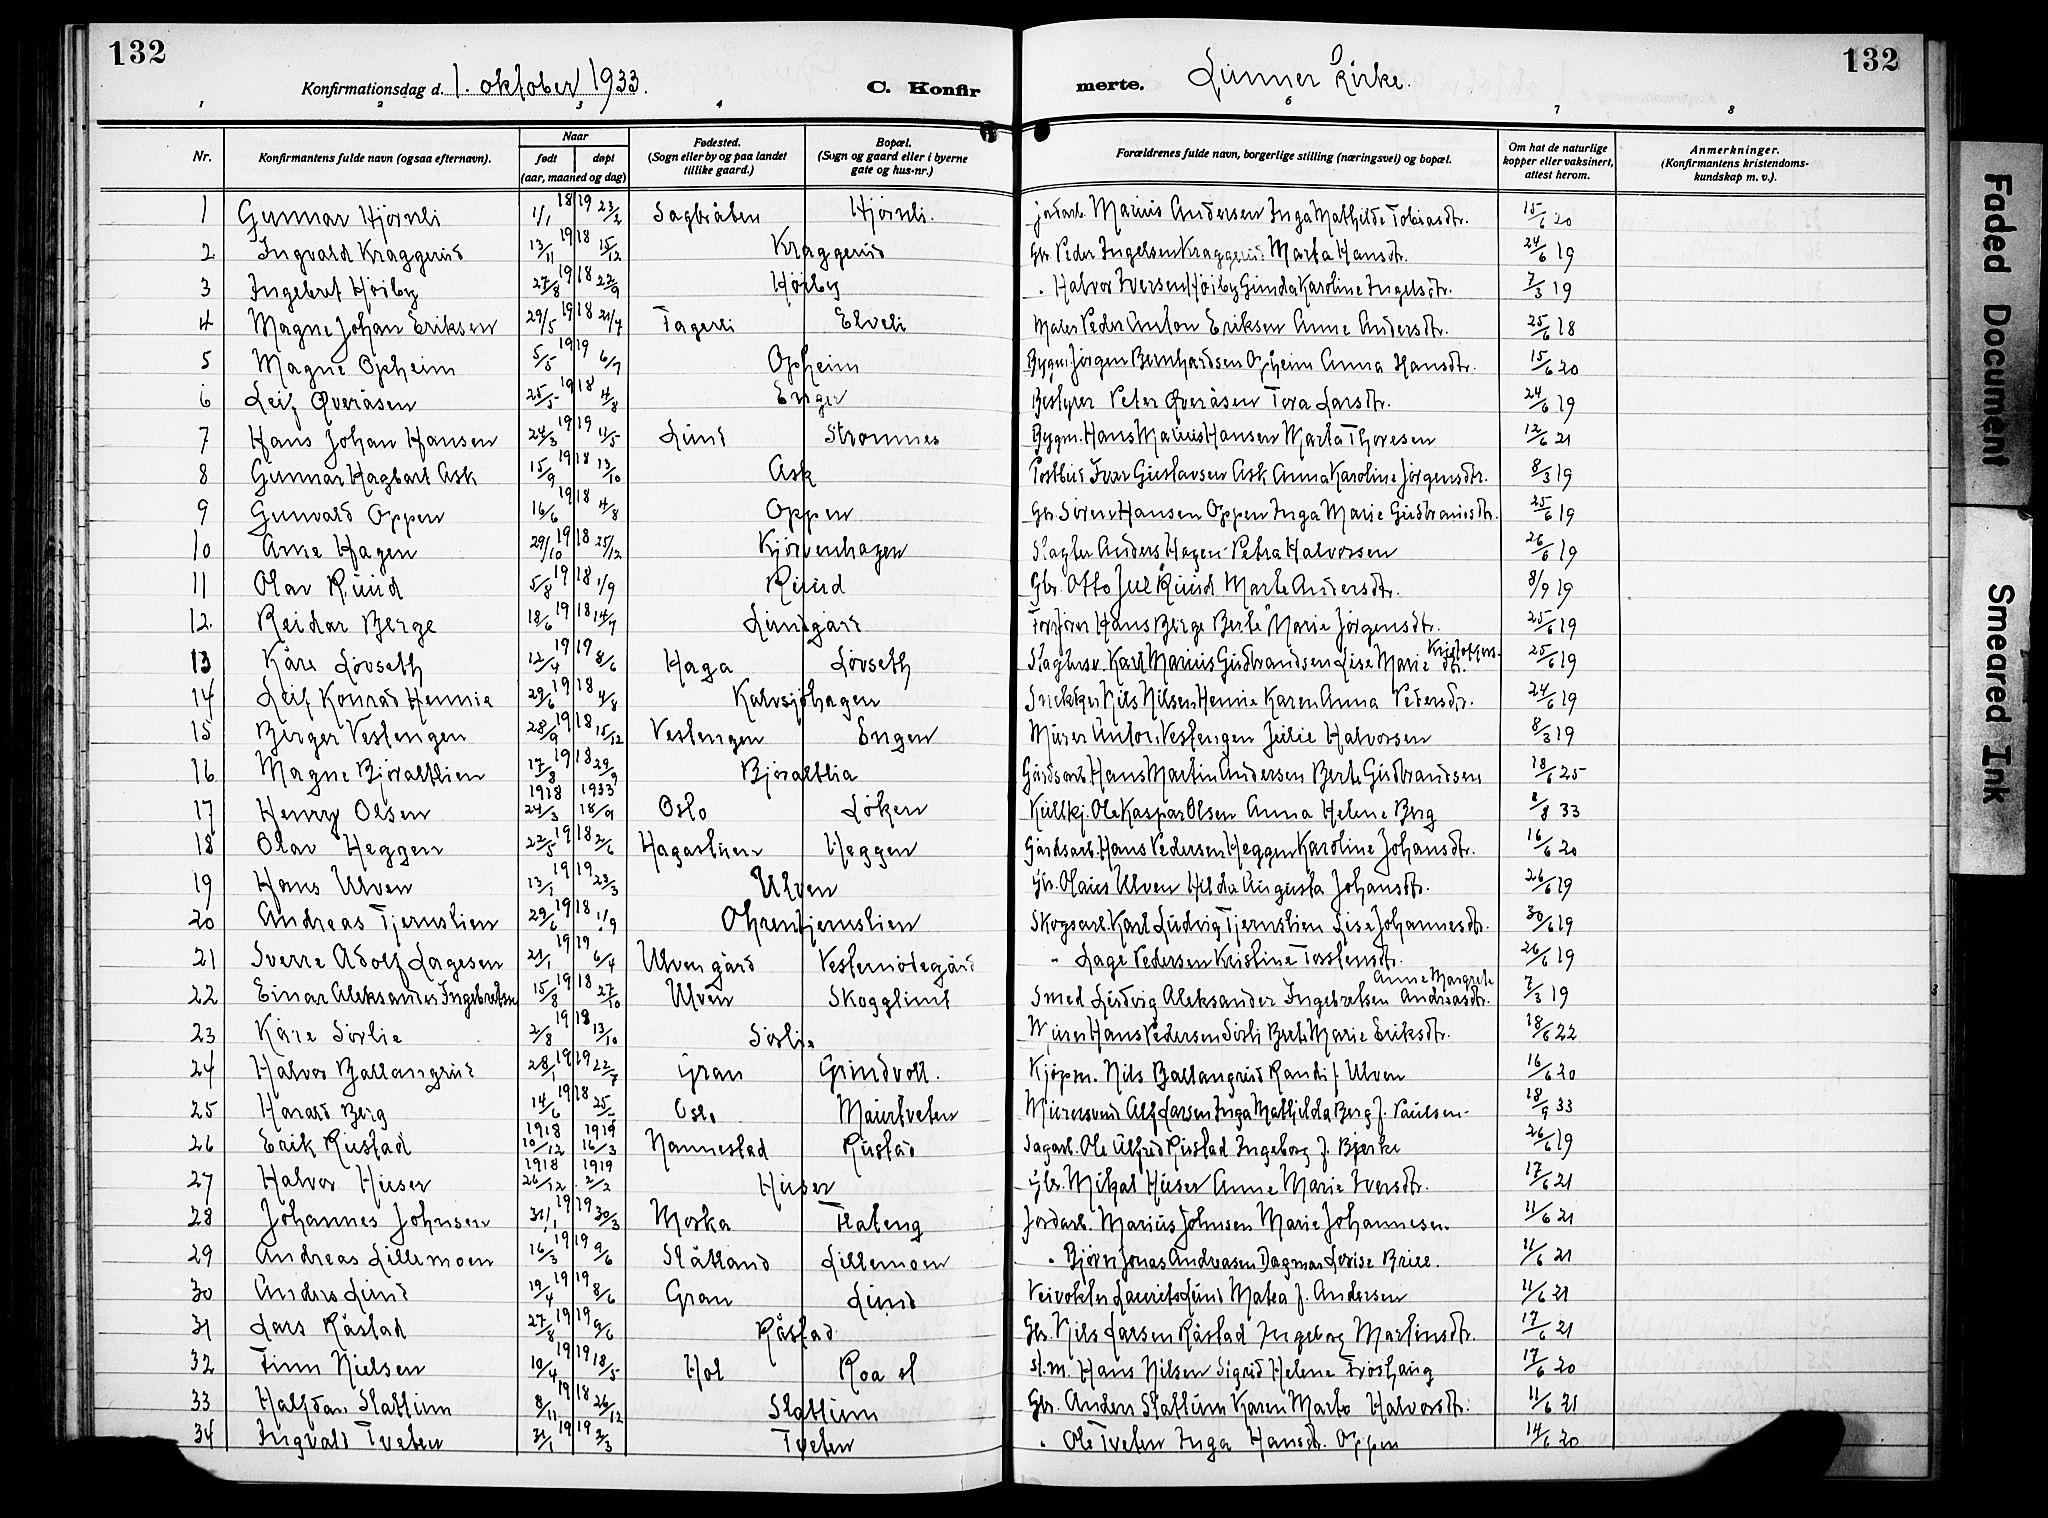 SAH, Lunner prestekontor, H/Ha/Hab/L0002: Klokkerbok nr. 2, 1923-1933, s. 132